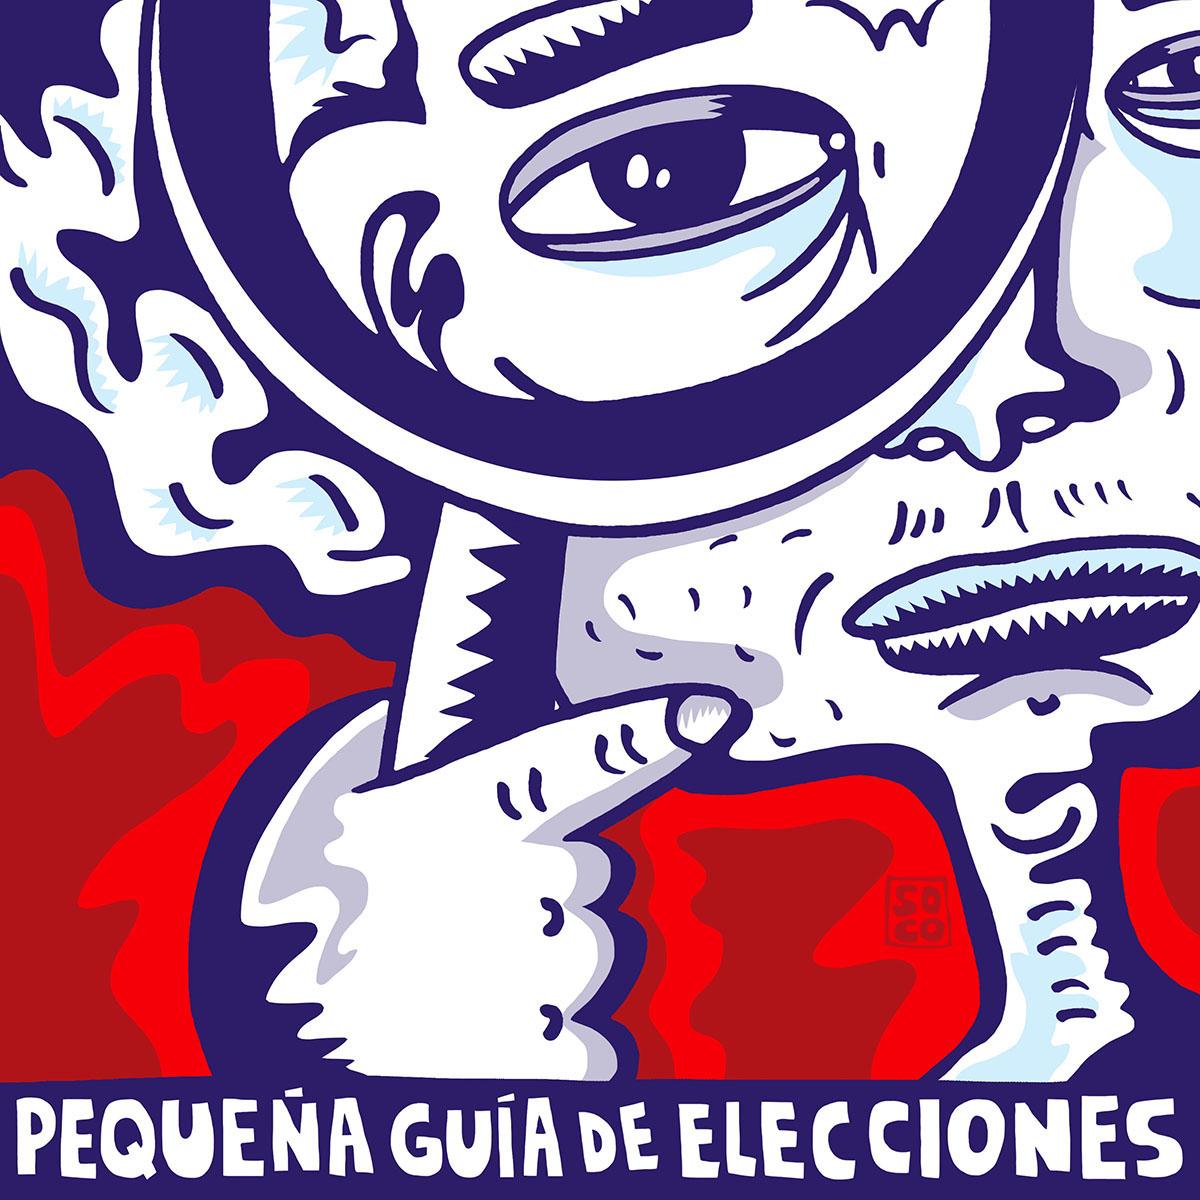 03_-T2_Latinos-en-pandemia_1.jpg